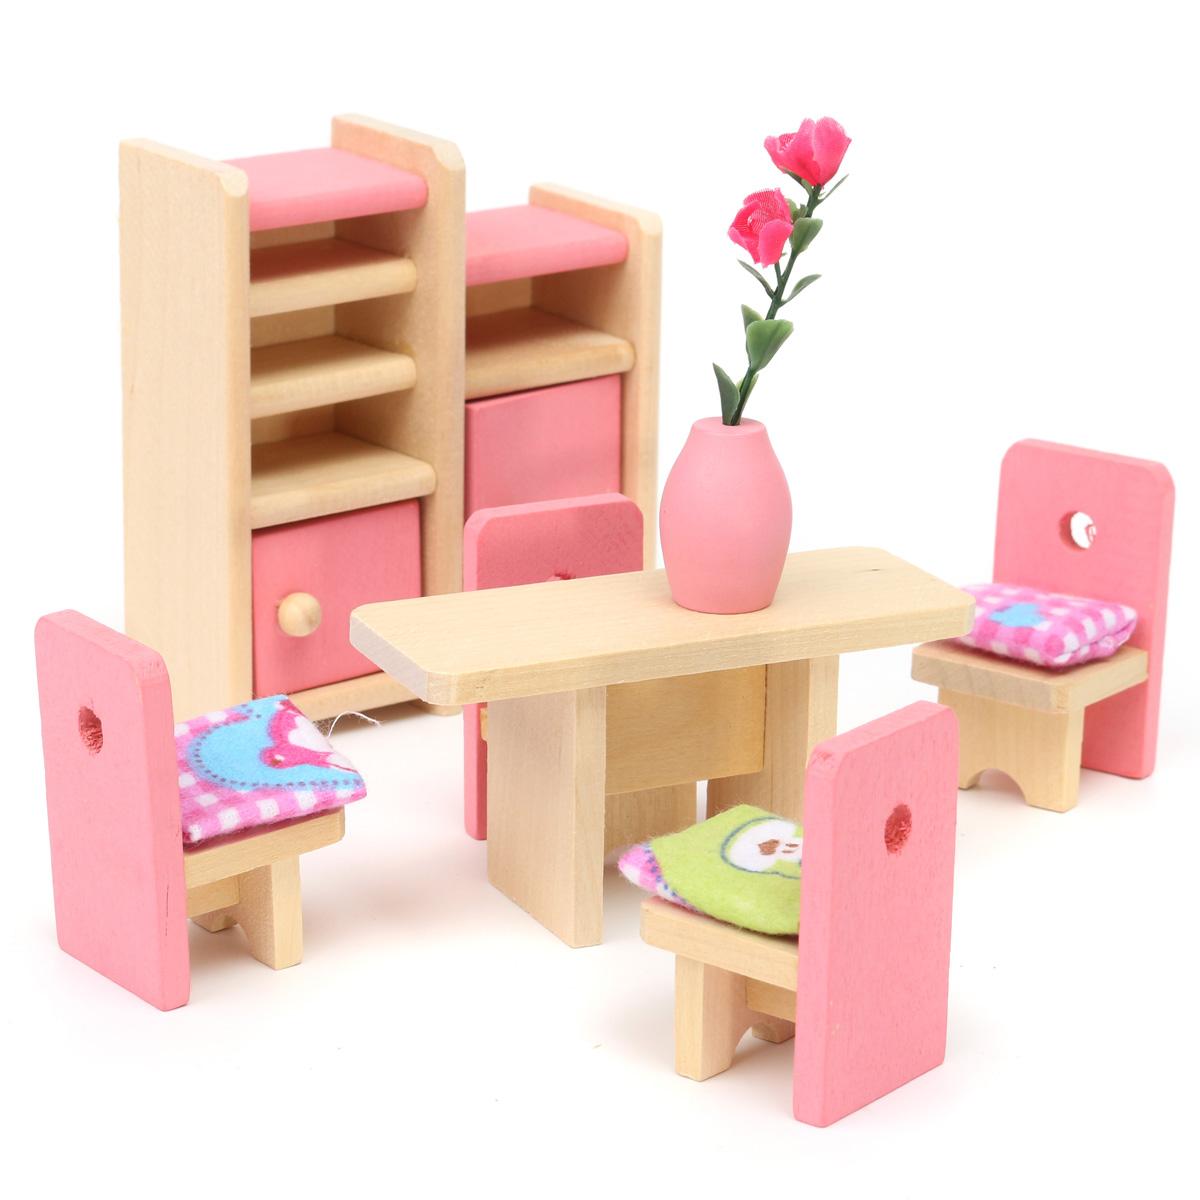 making dolls house furniture. Mini Doll Furniture. Wooden-furniture-room-set-dolls-house- Making Dolls House Furniture S